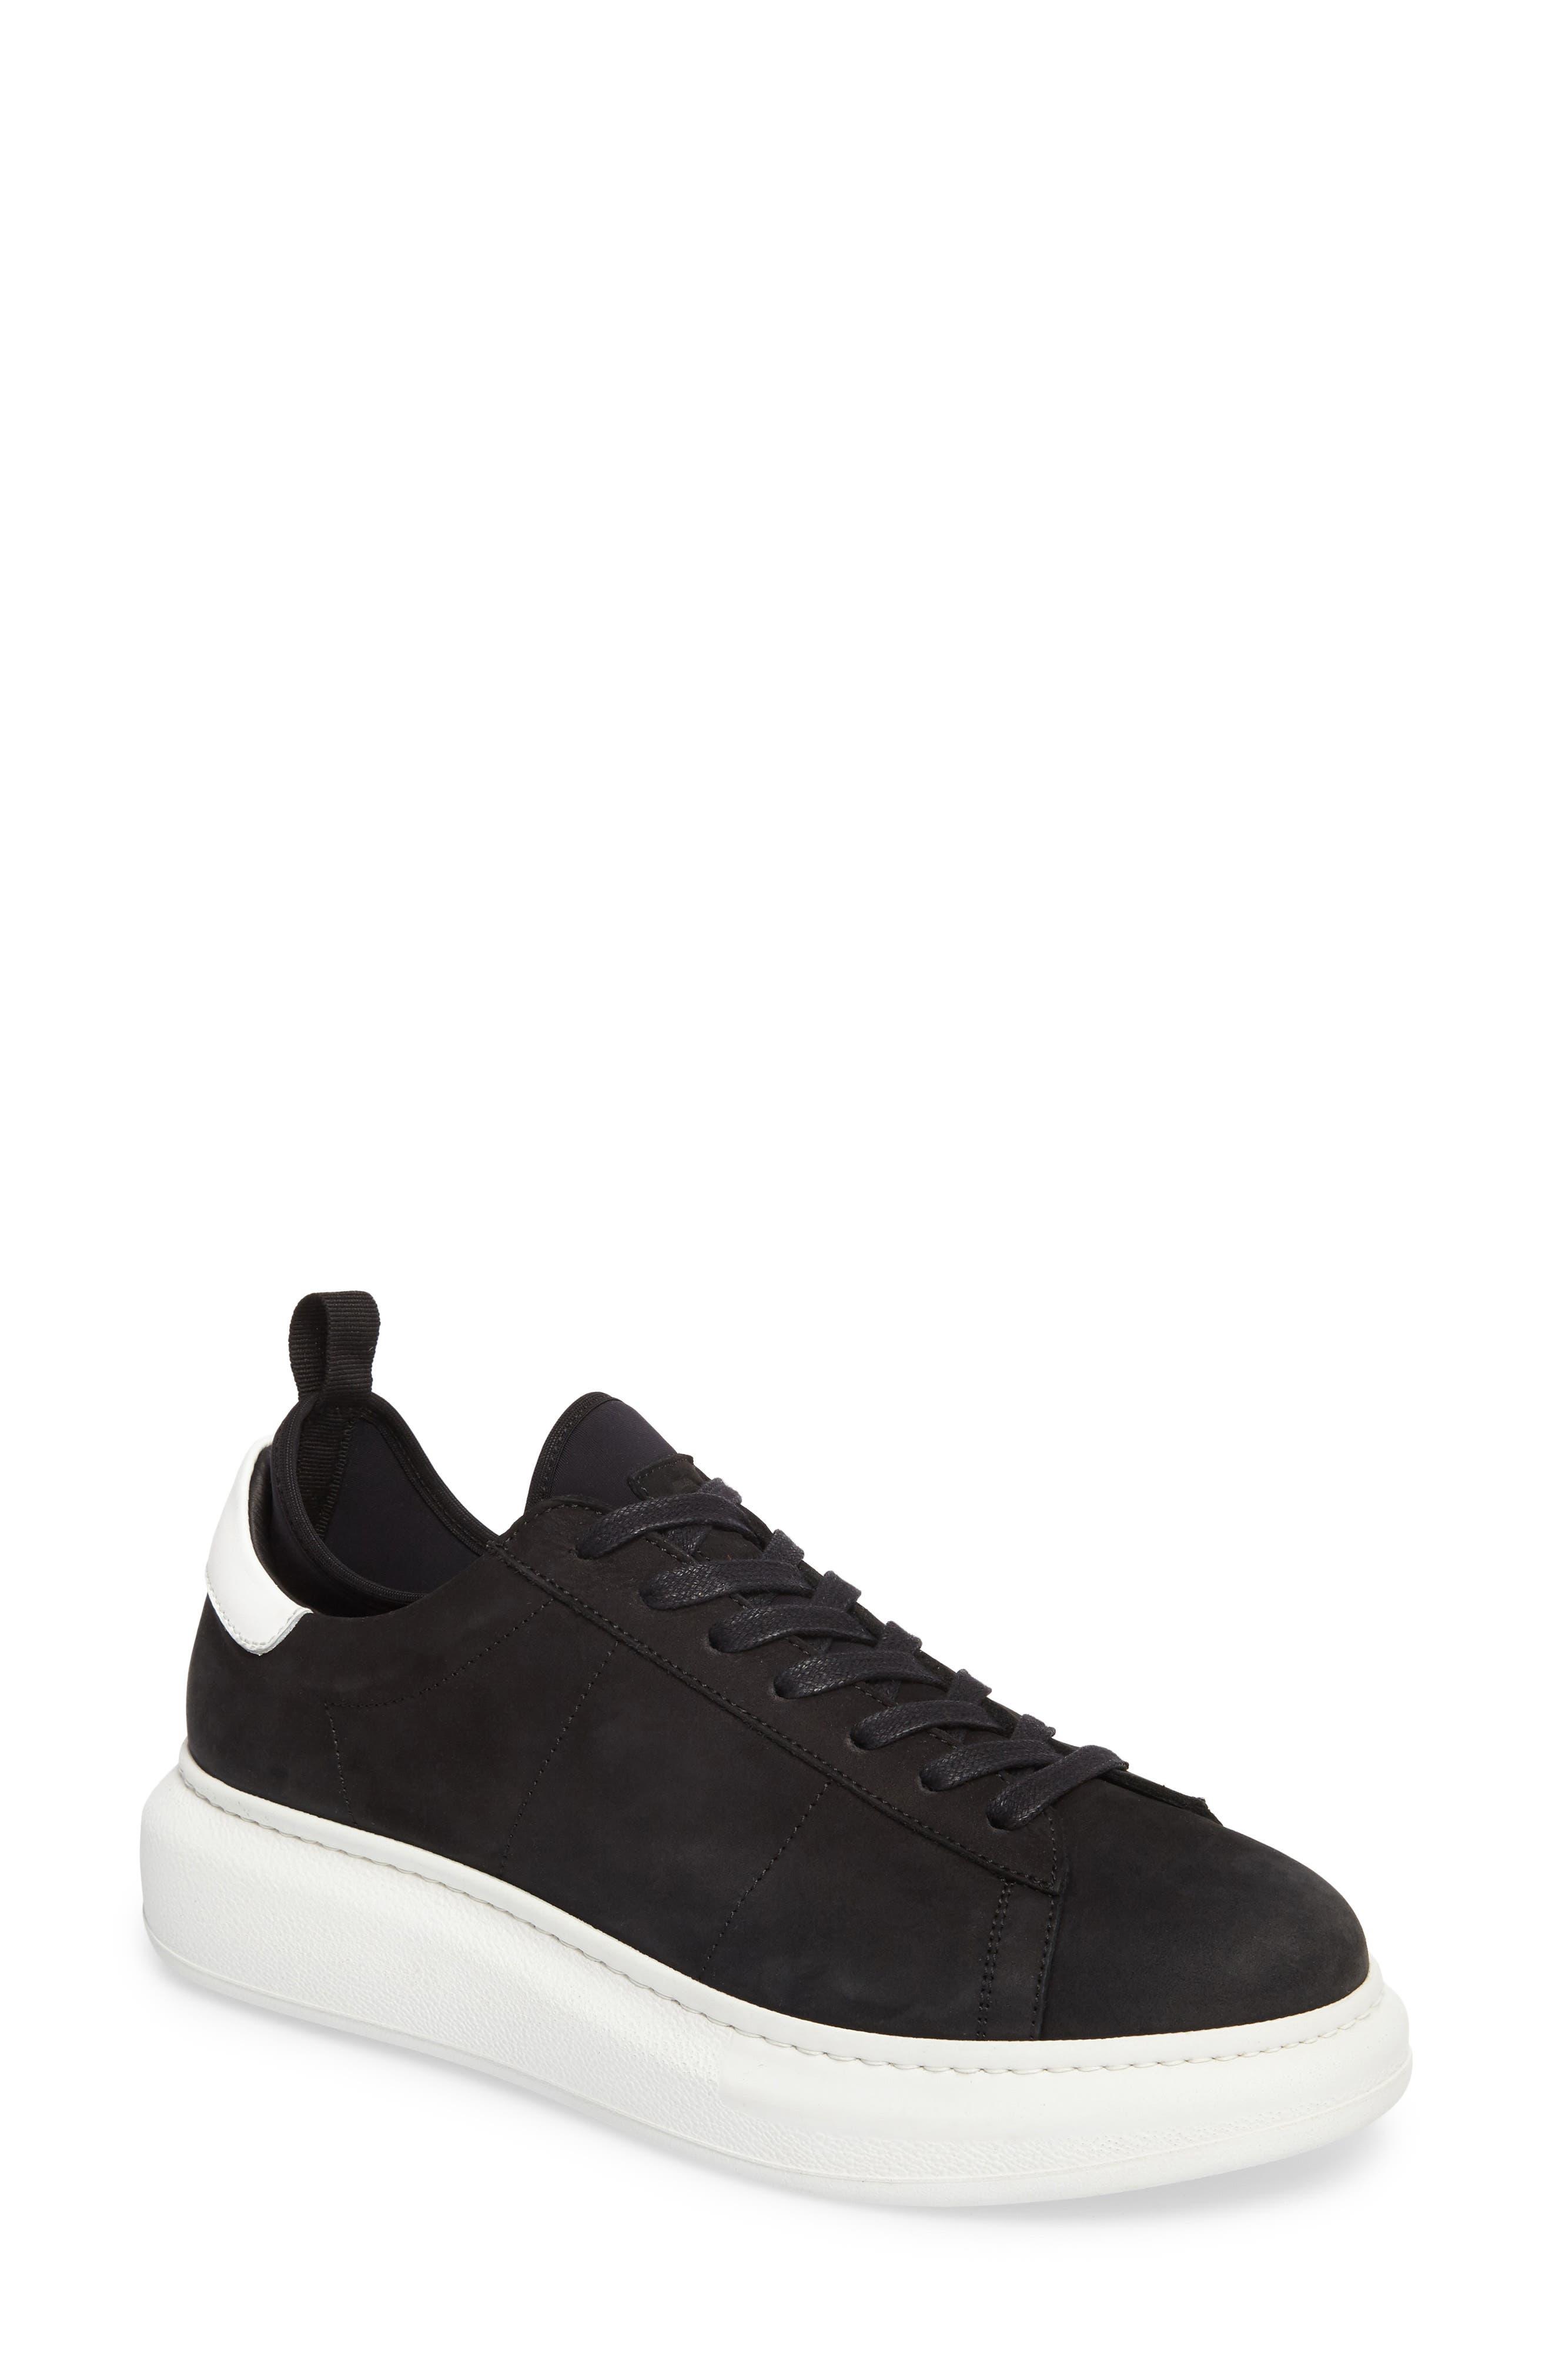 GREATS Alta Low Top Sneaker (Women